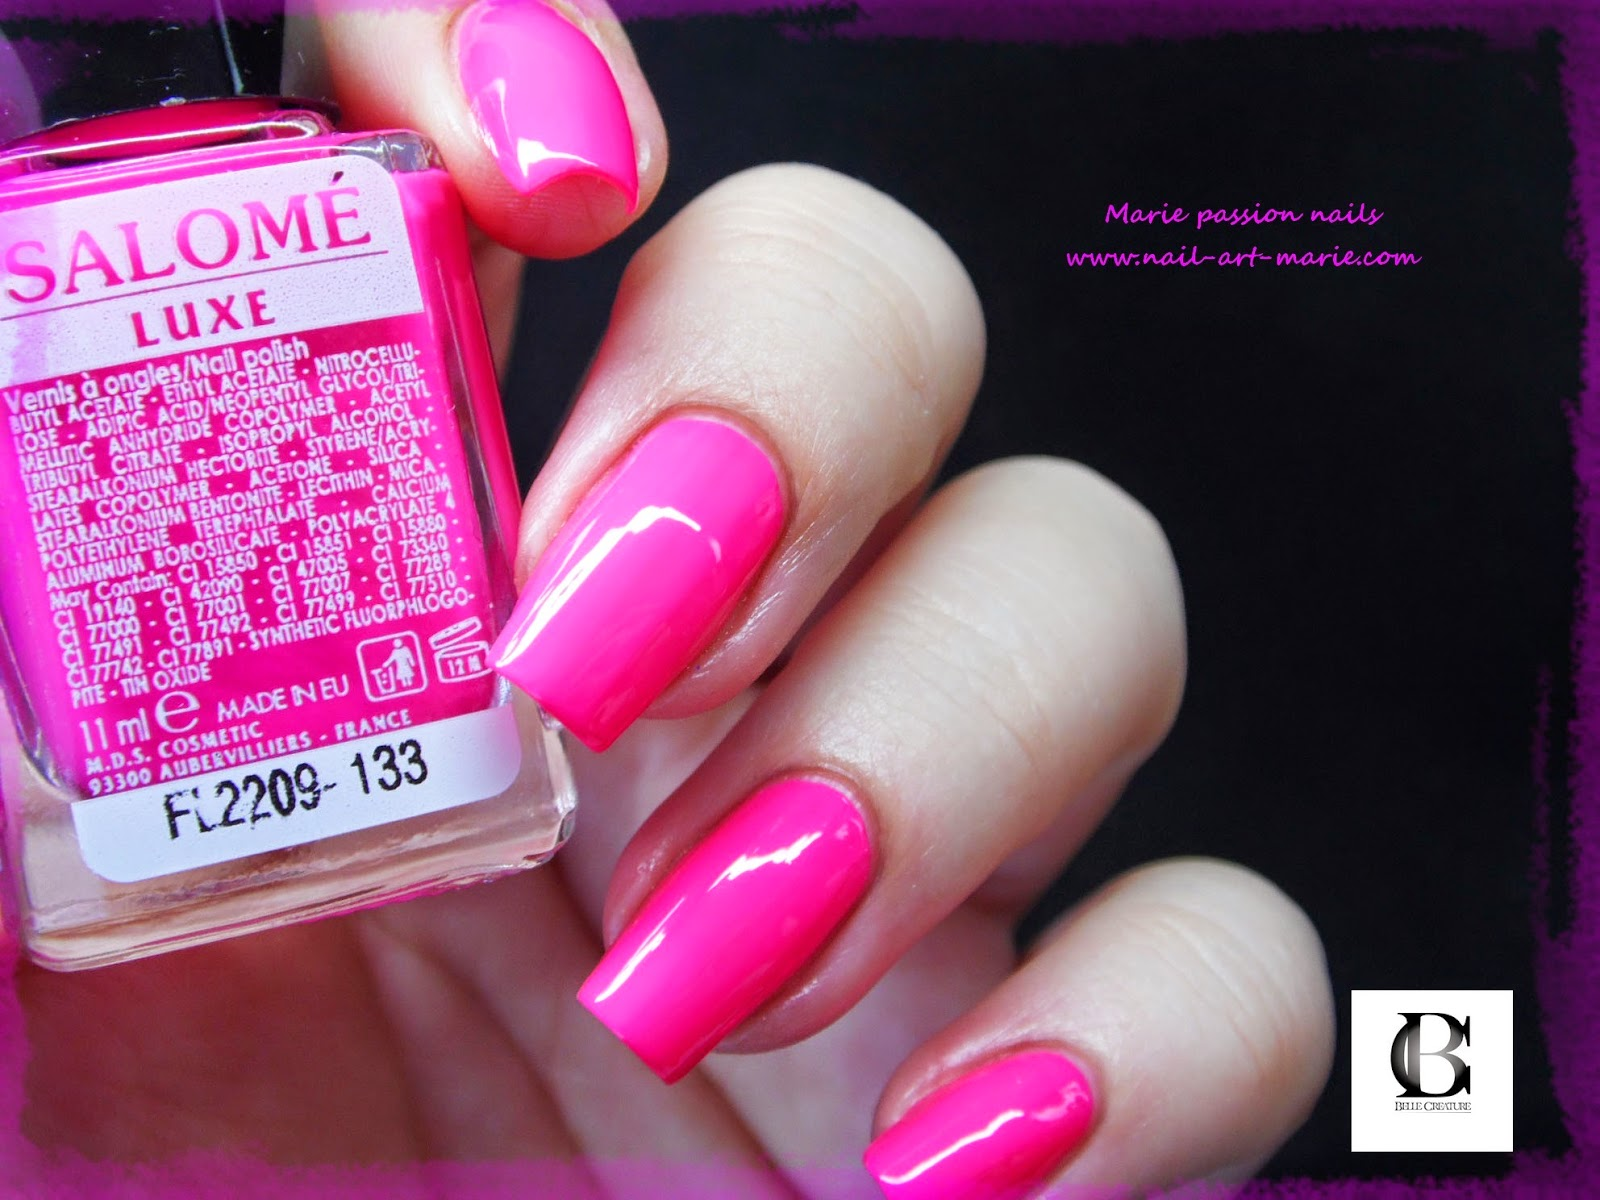 Salomé Luxe rose fluo3